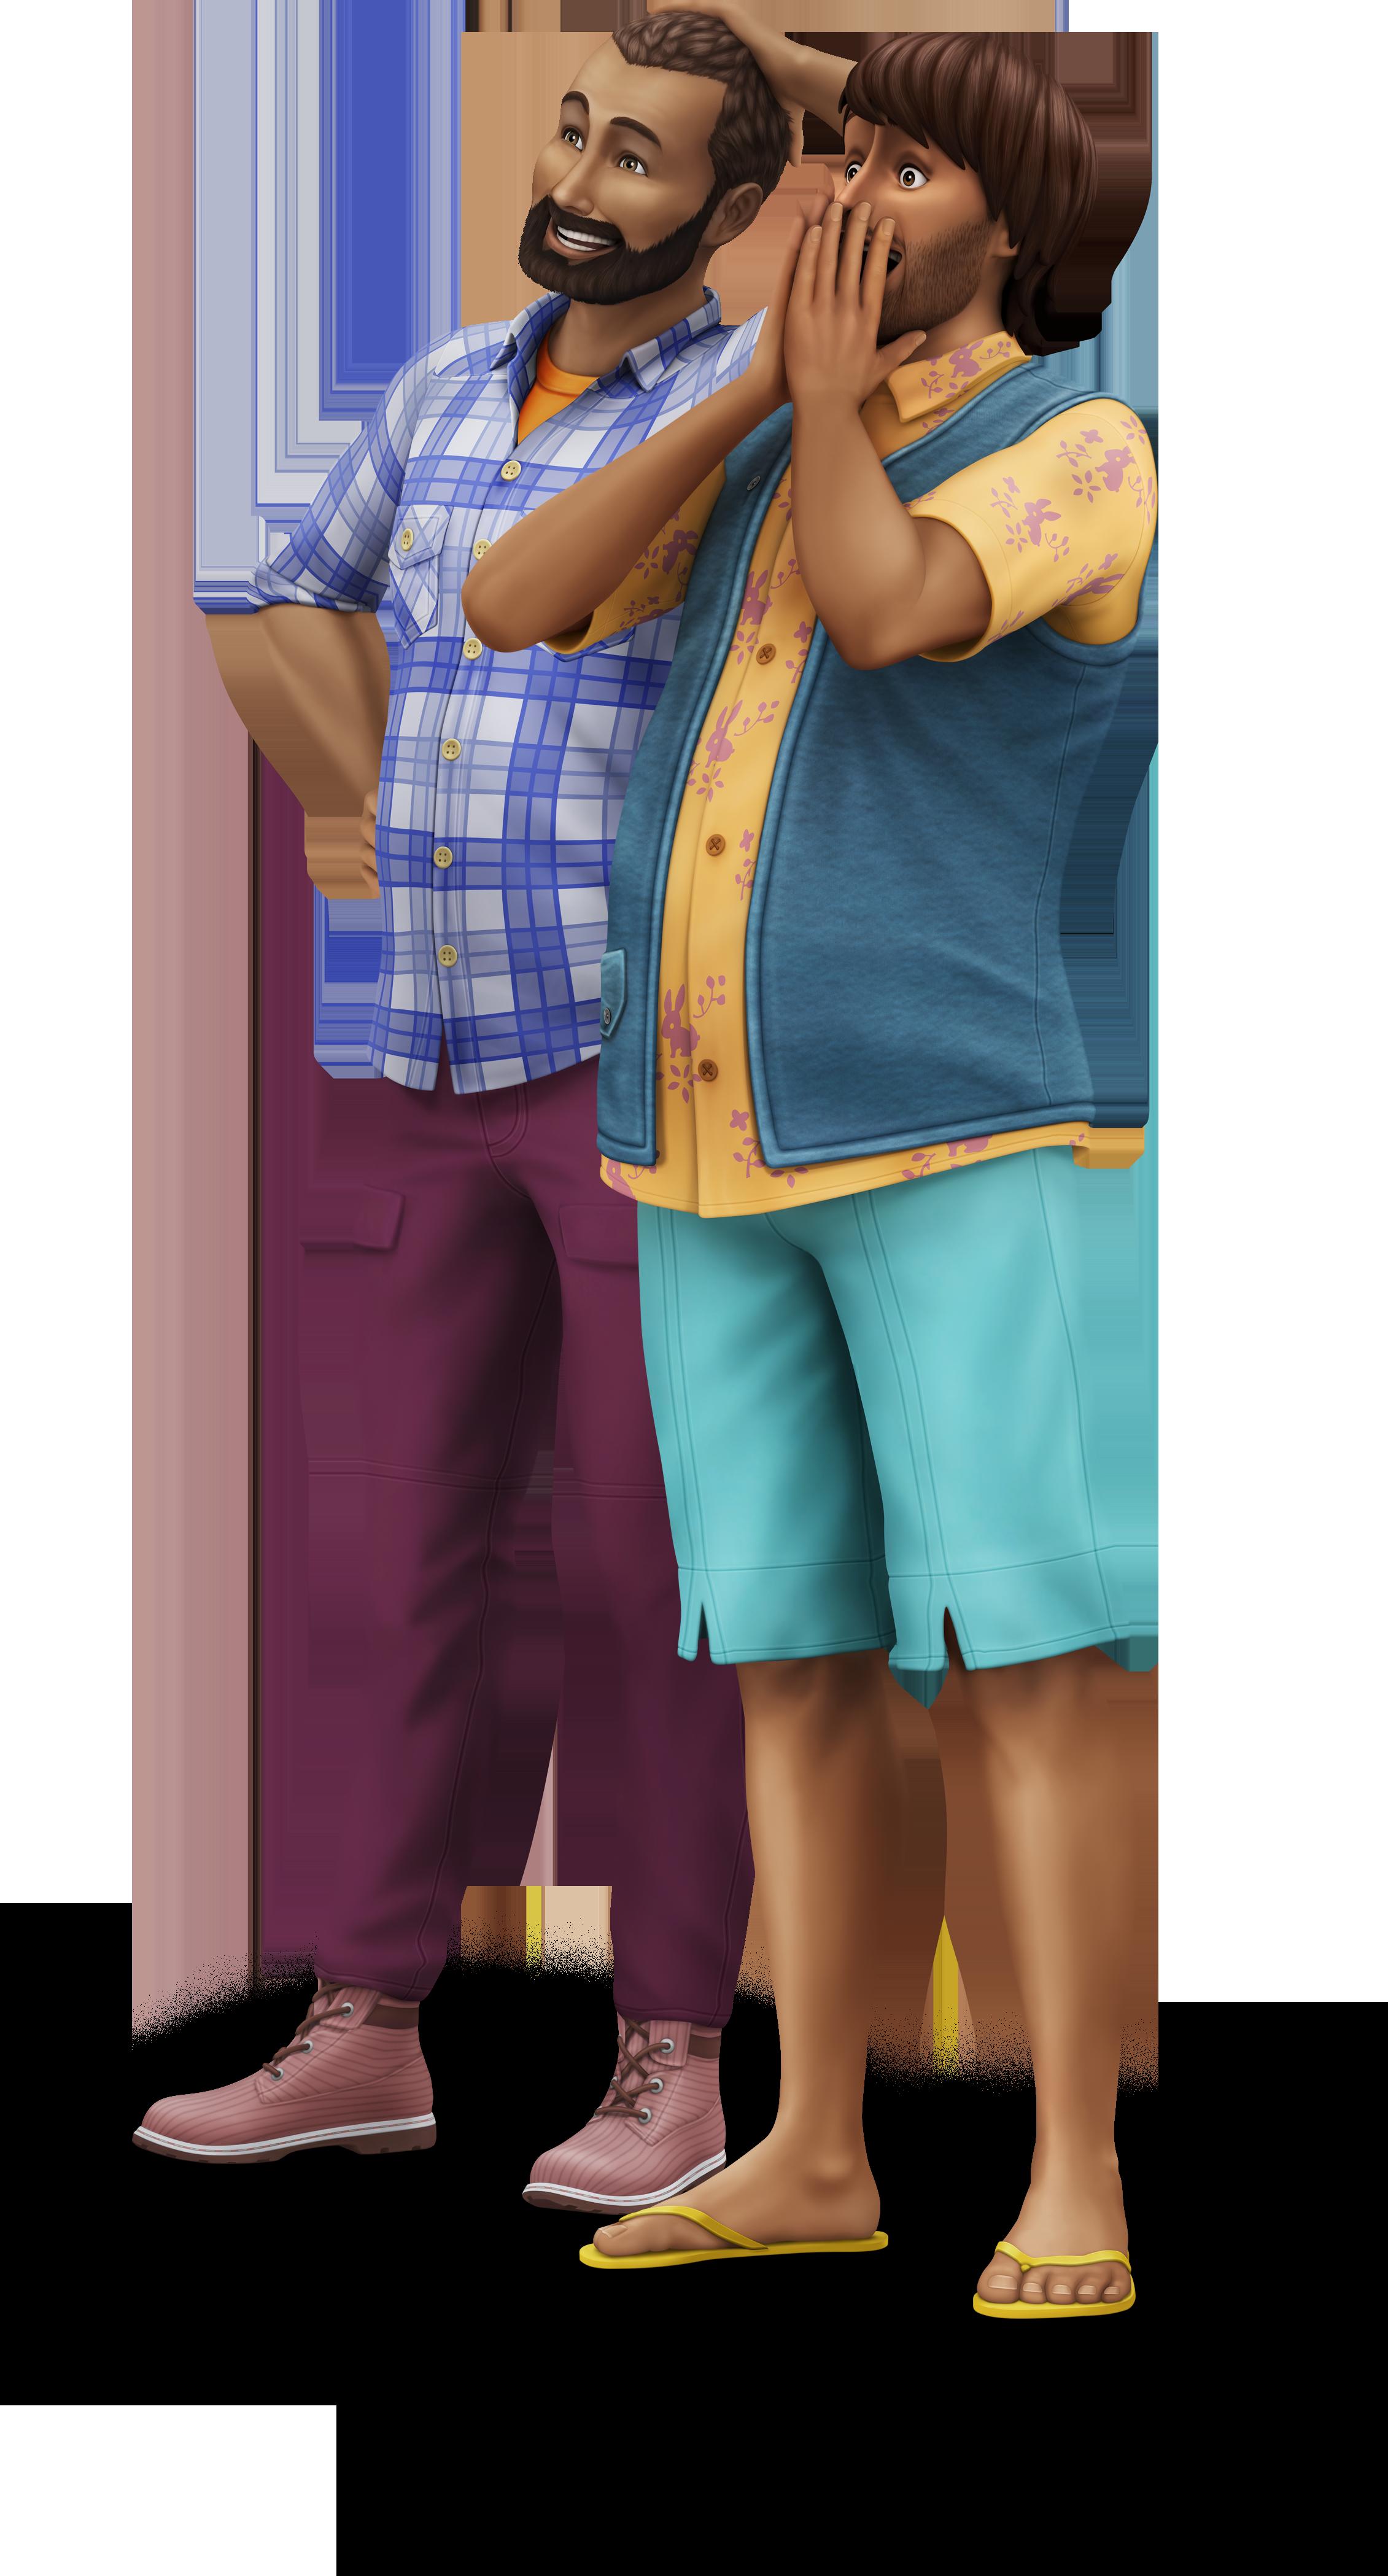 The-Sims-4-Dream-Home-Decorator-License-Serial-Keys-pc-mac